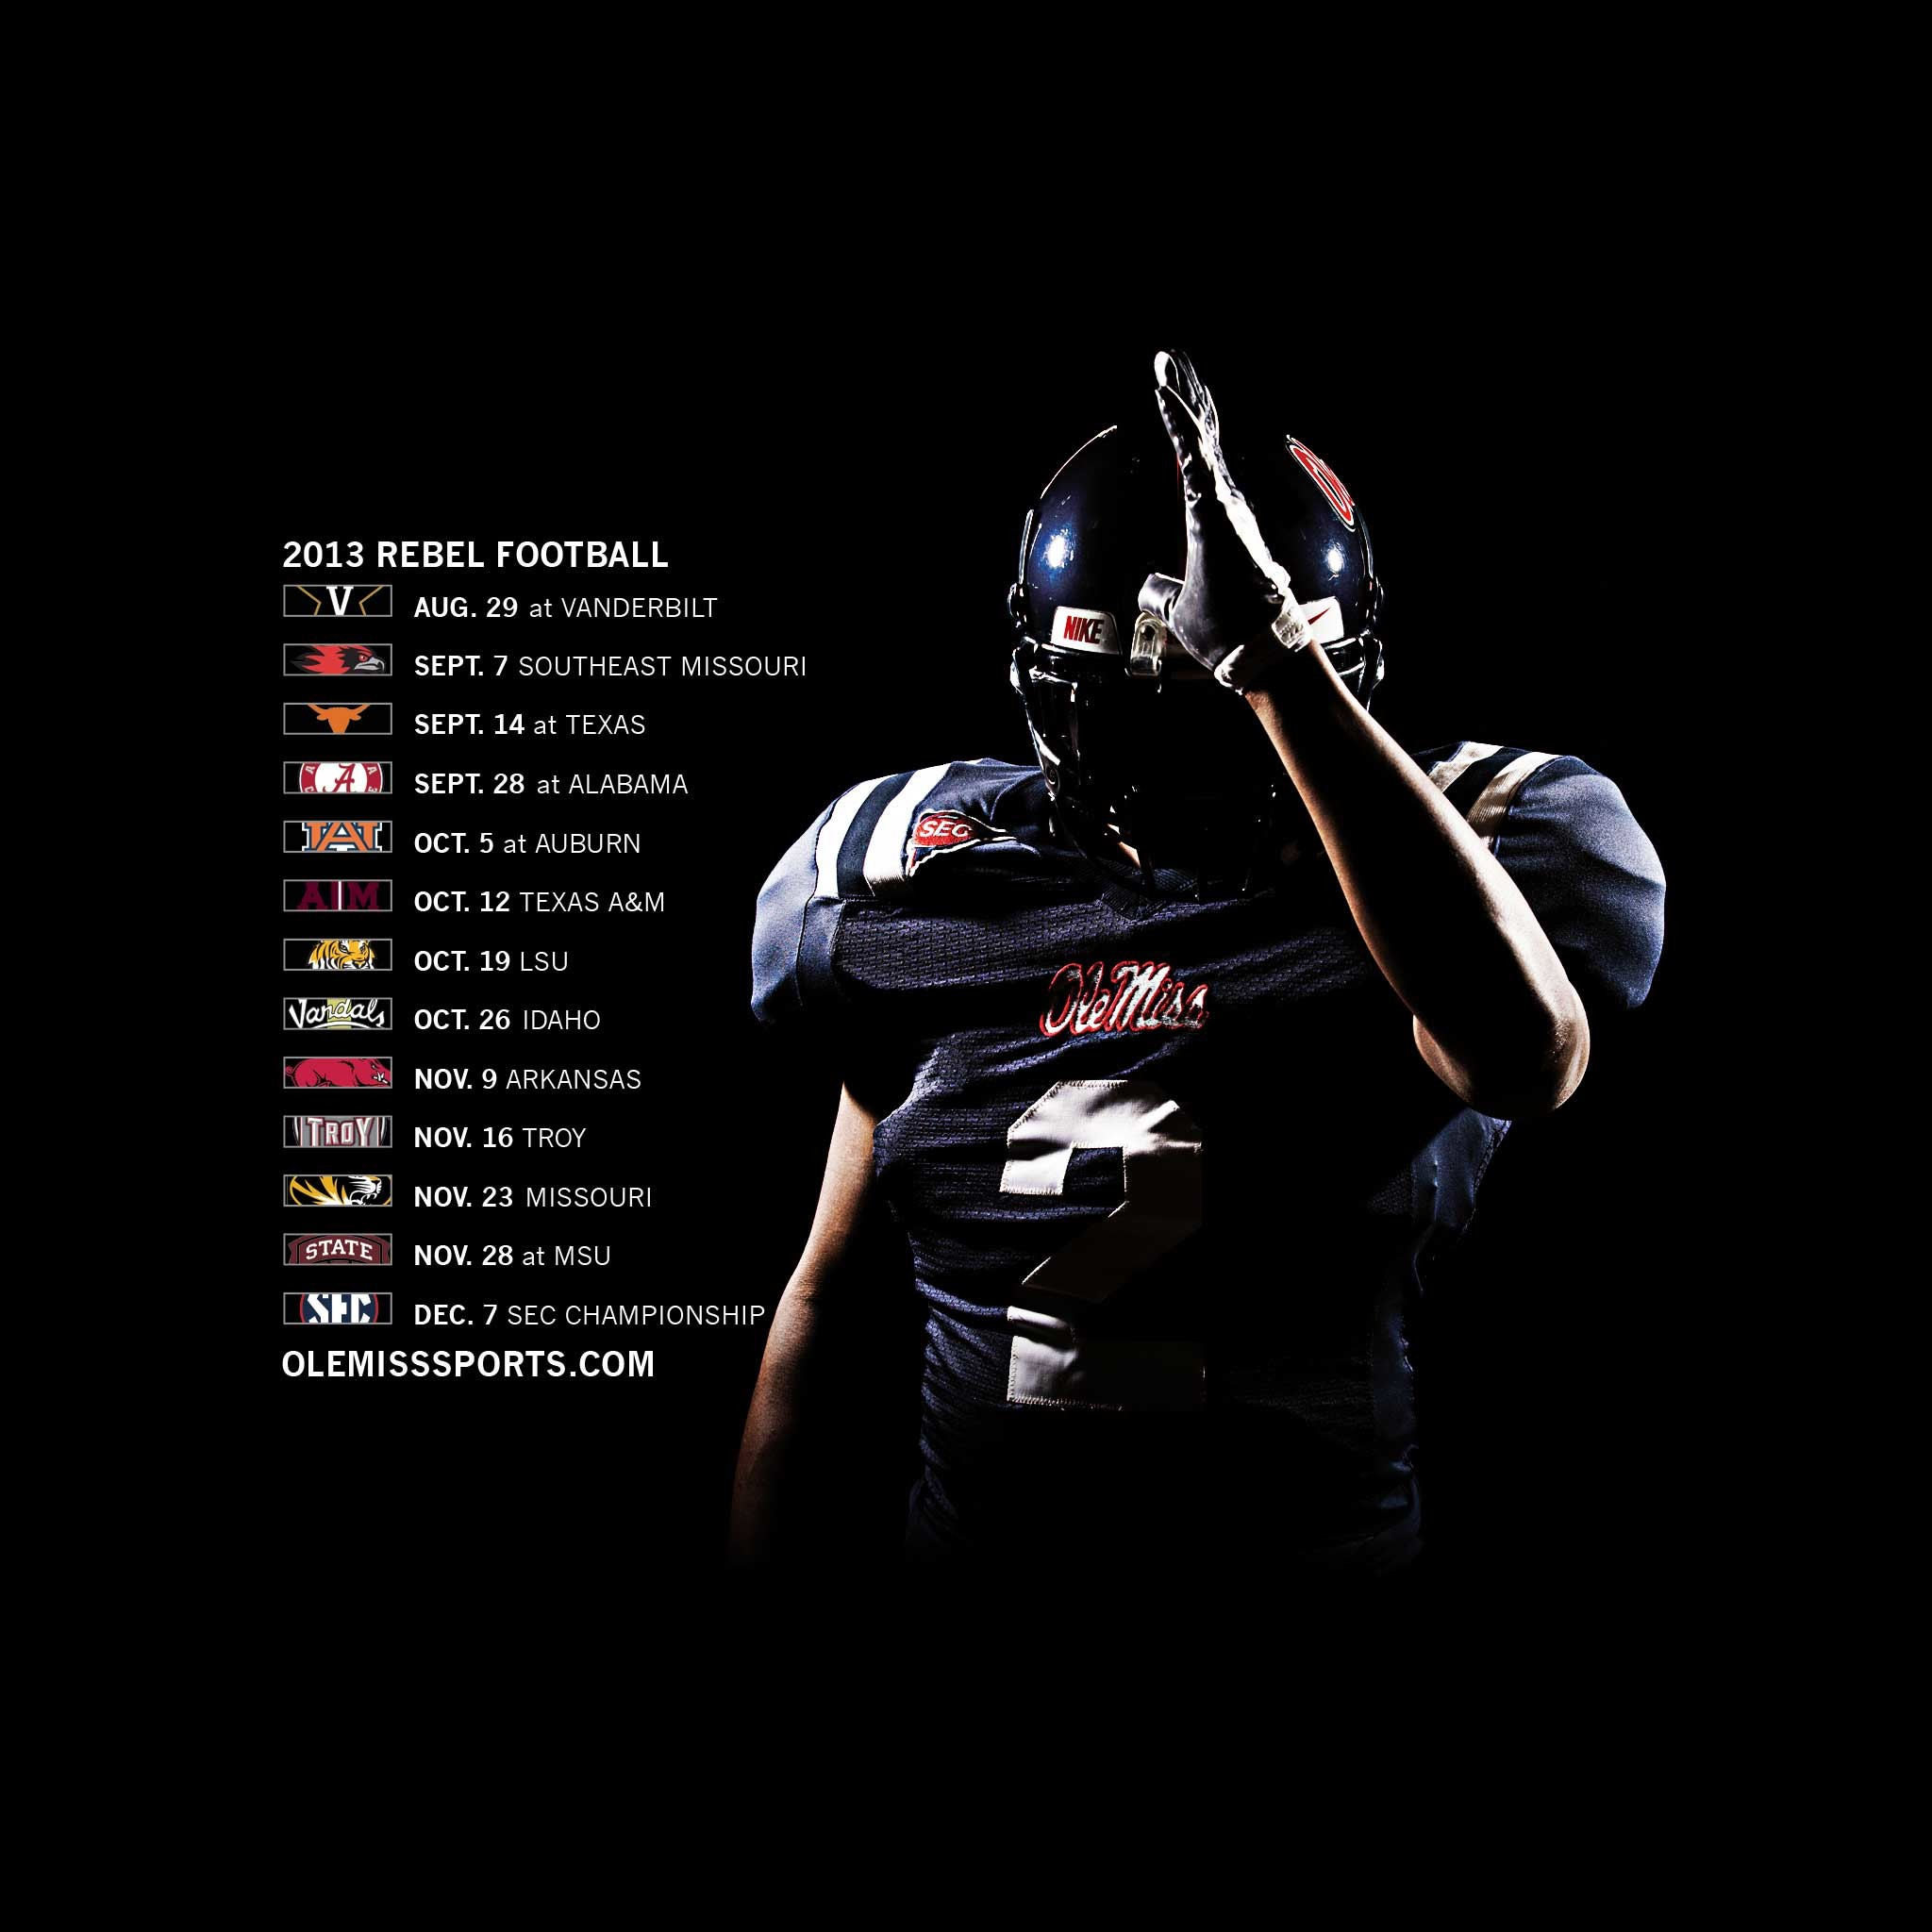 Alabama Football Screensavers and Wallpaper